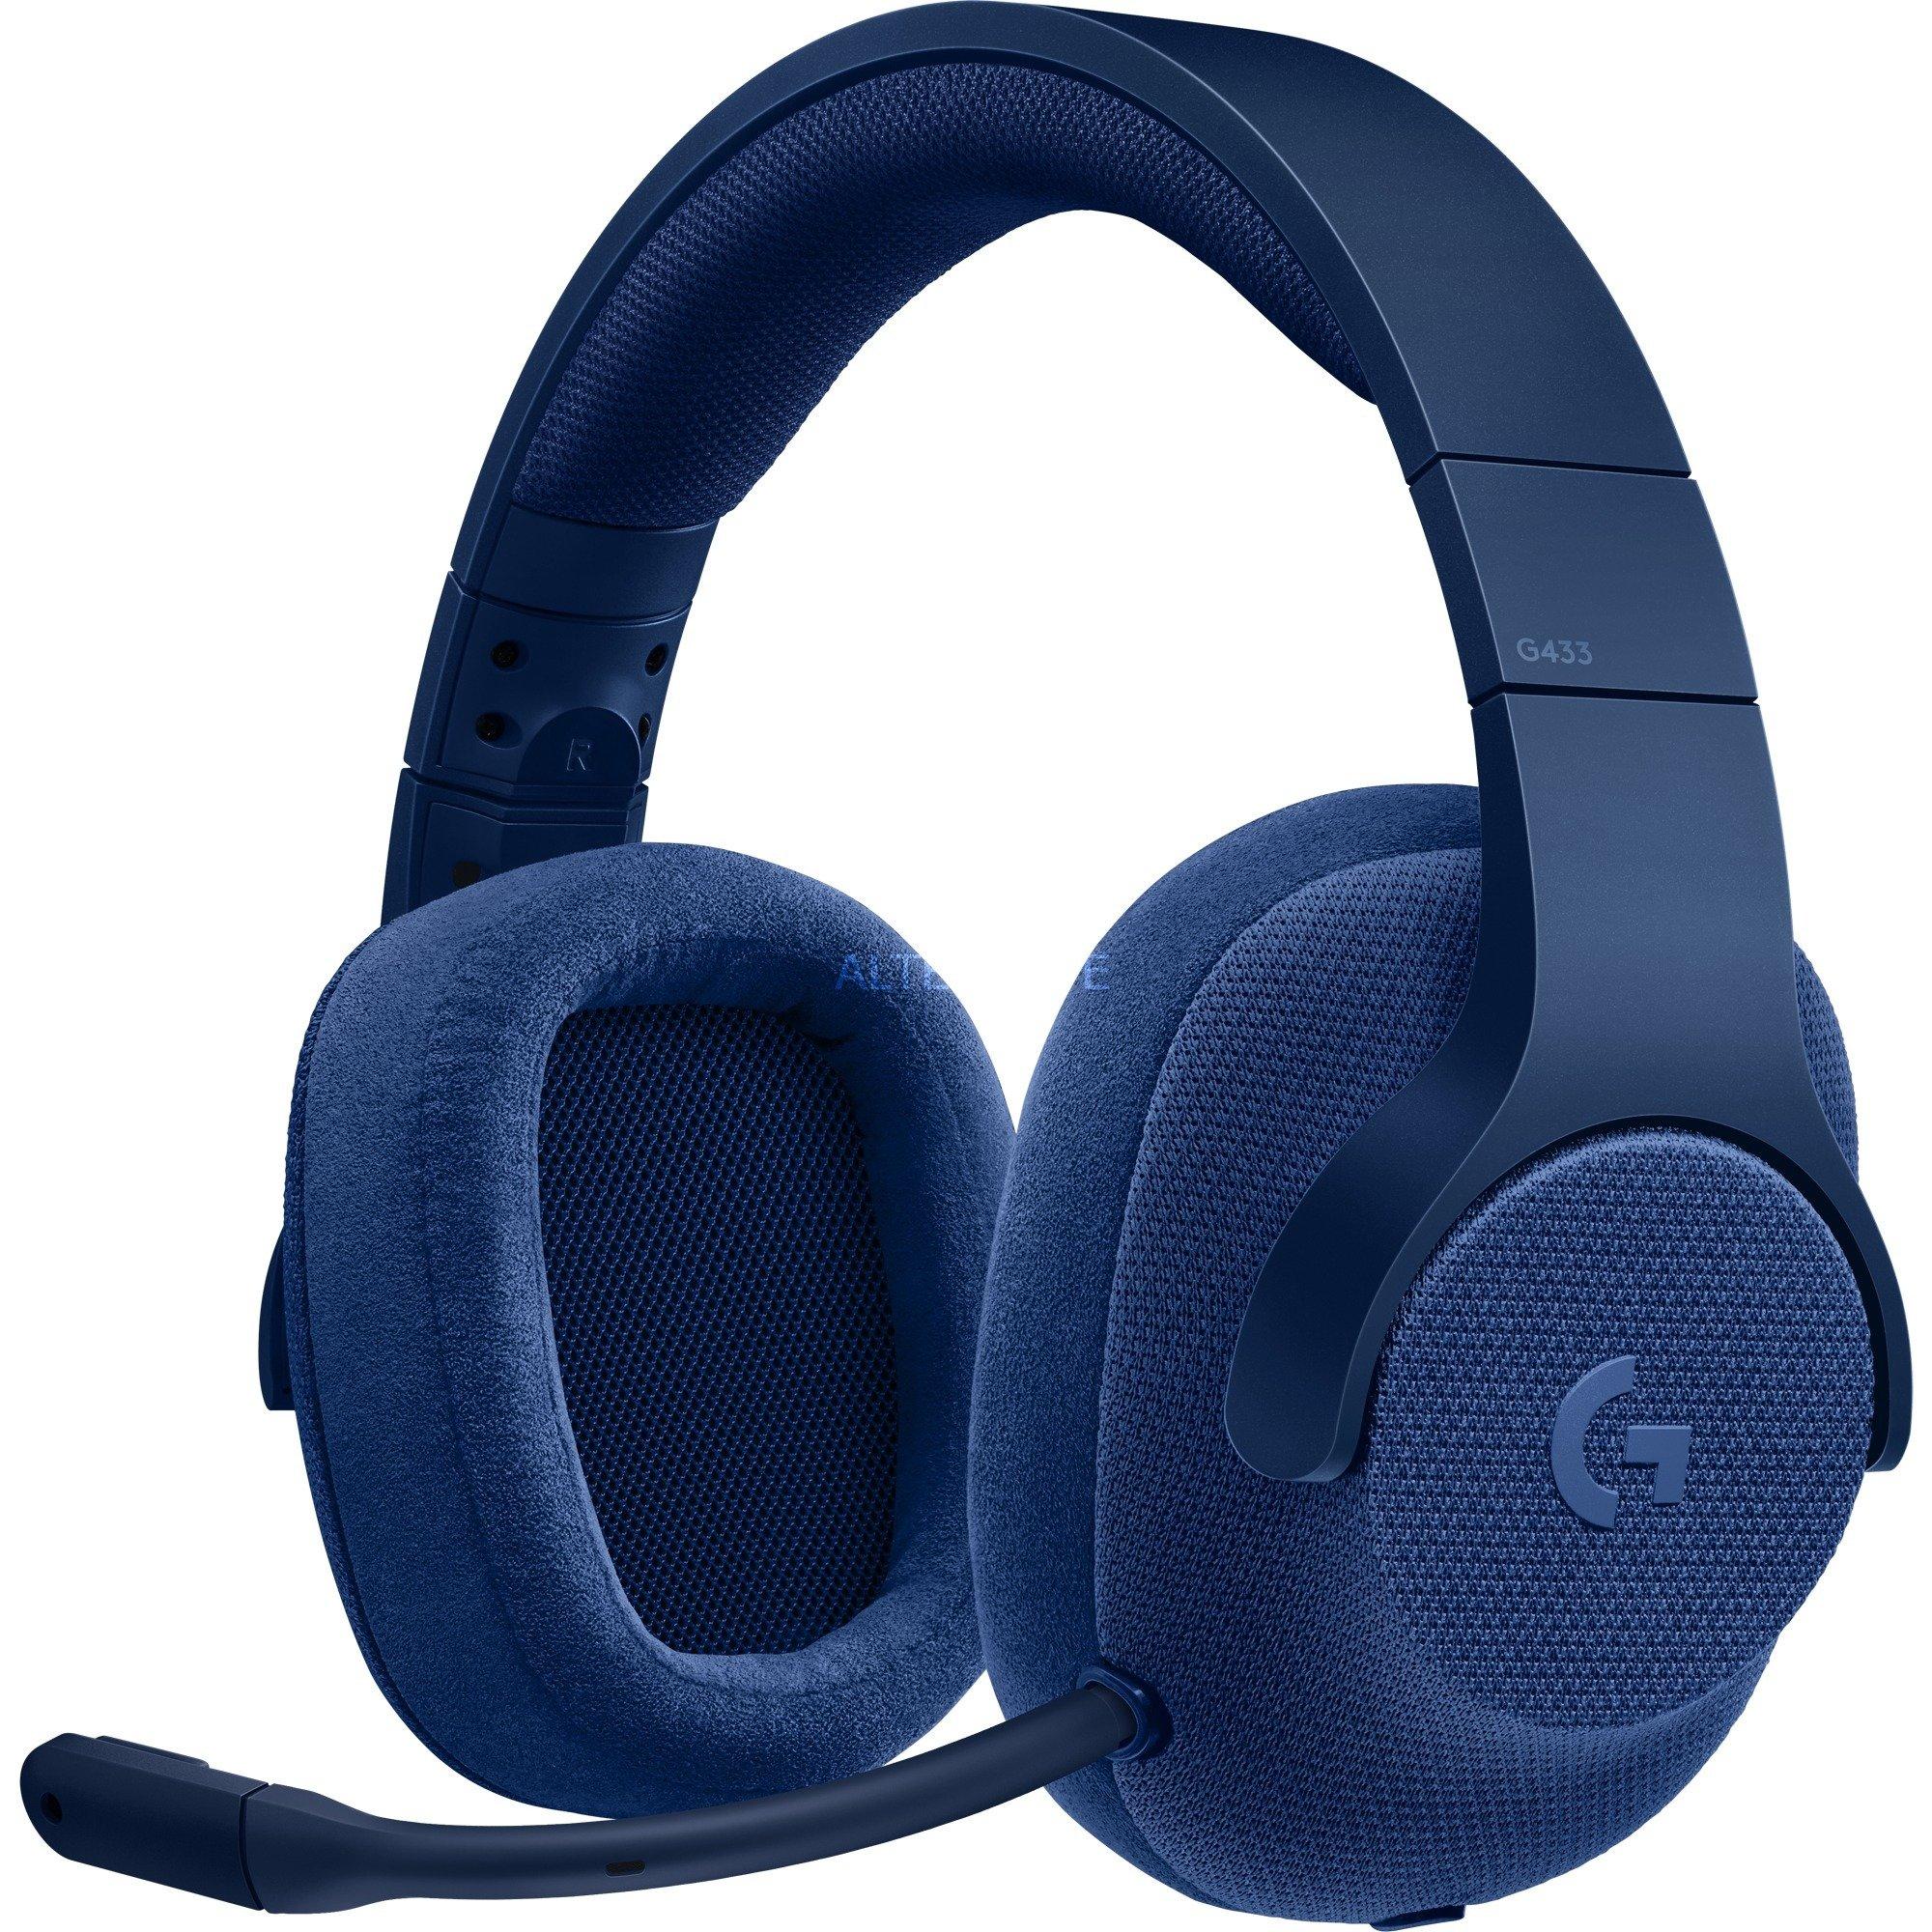 G433 Binaurale Diadema Azul auricular con micrófono, Auriculares con micrófono